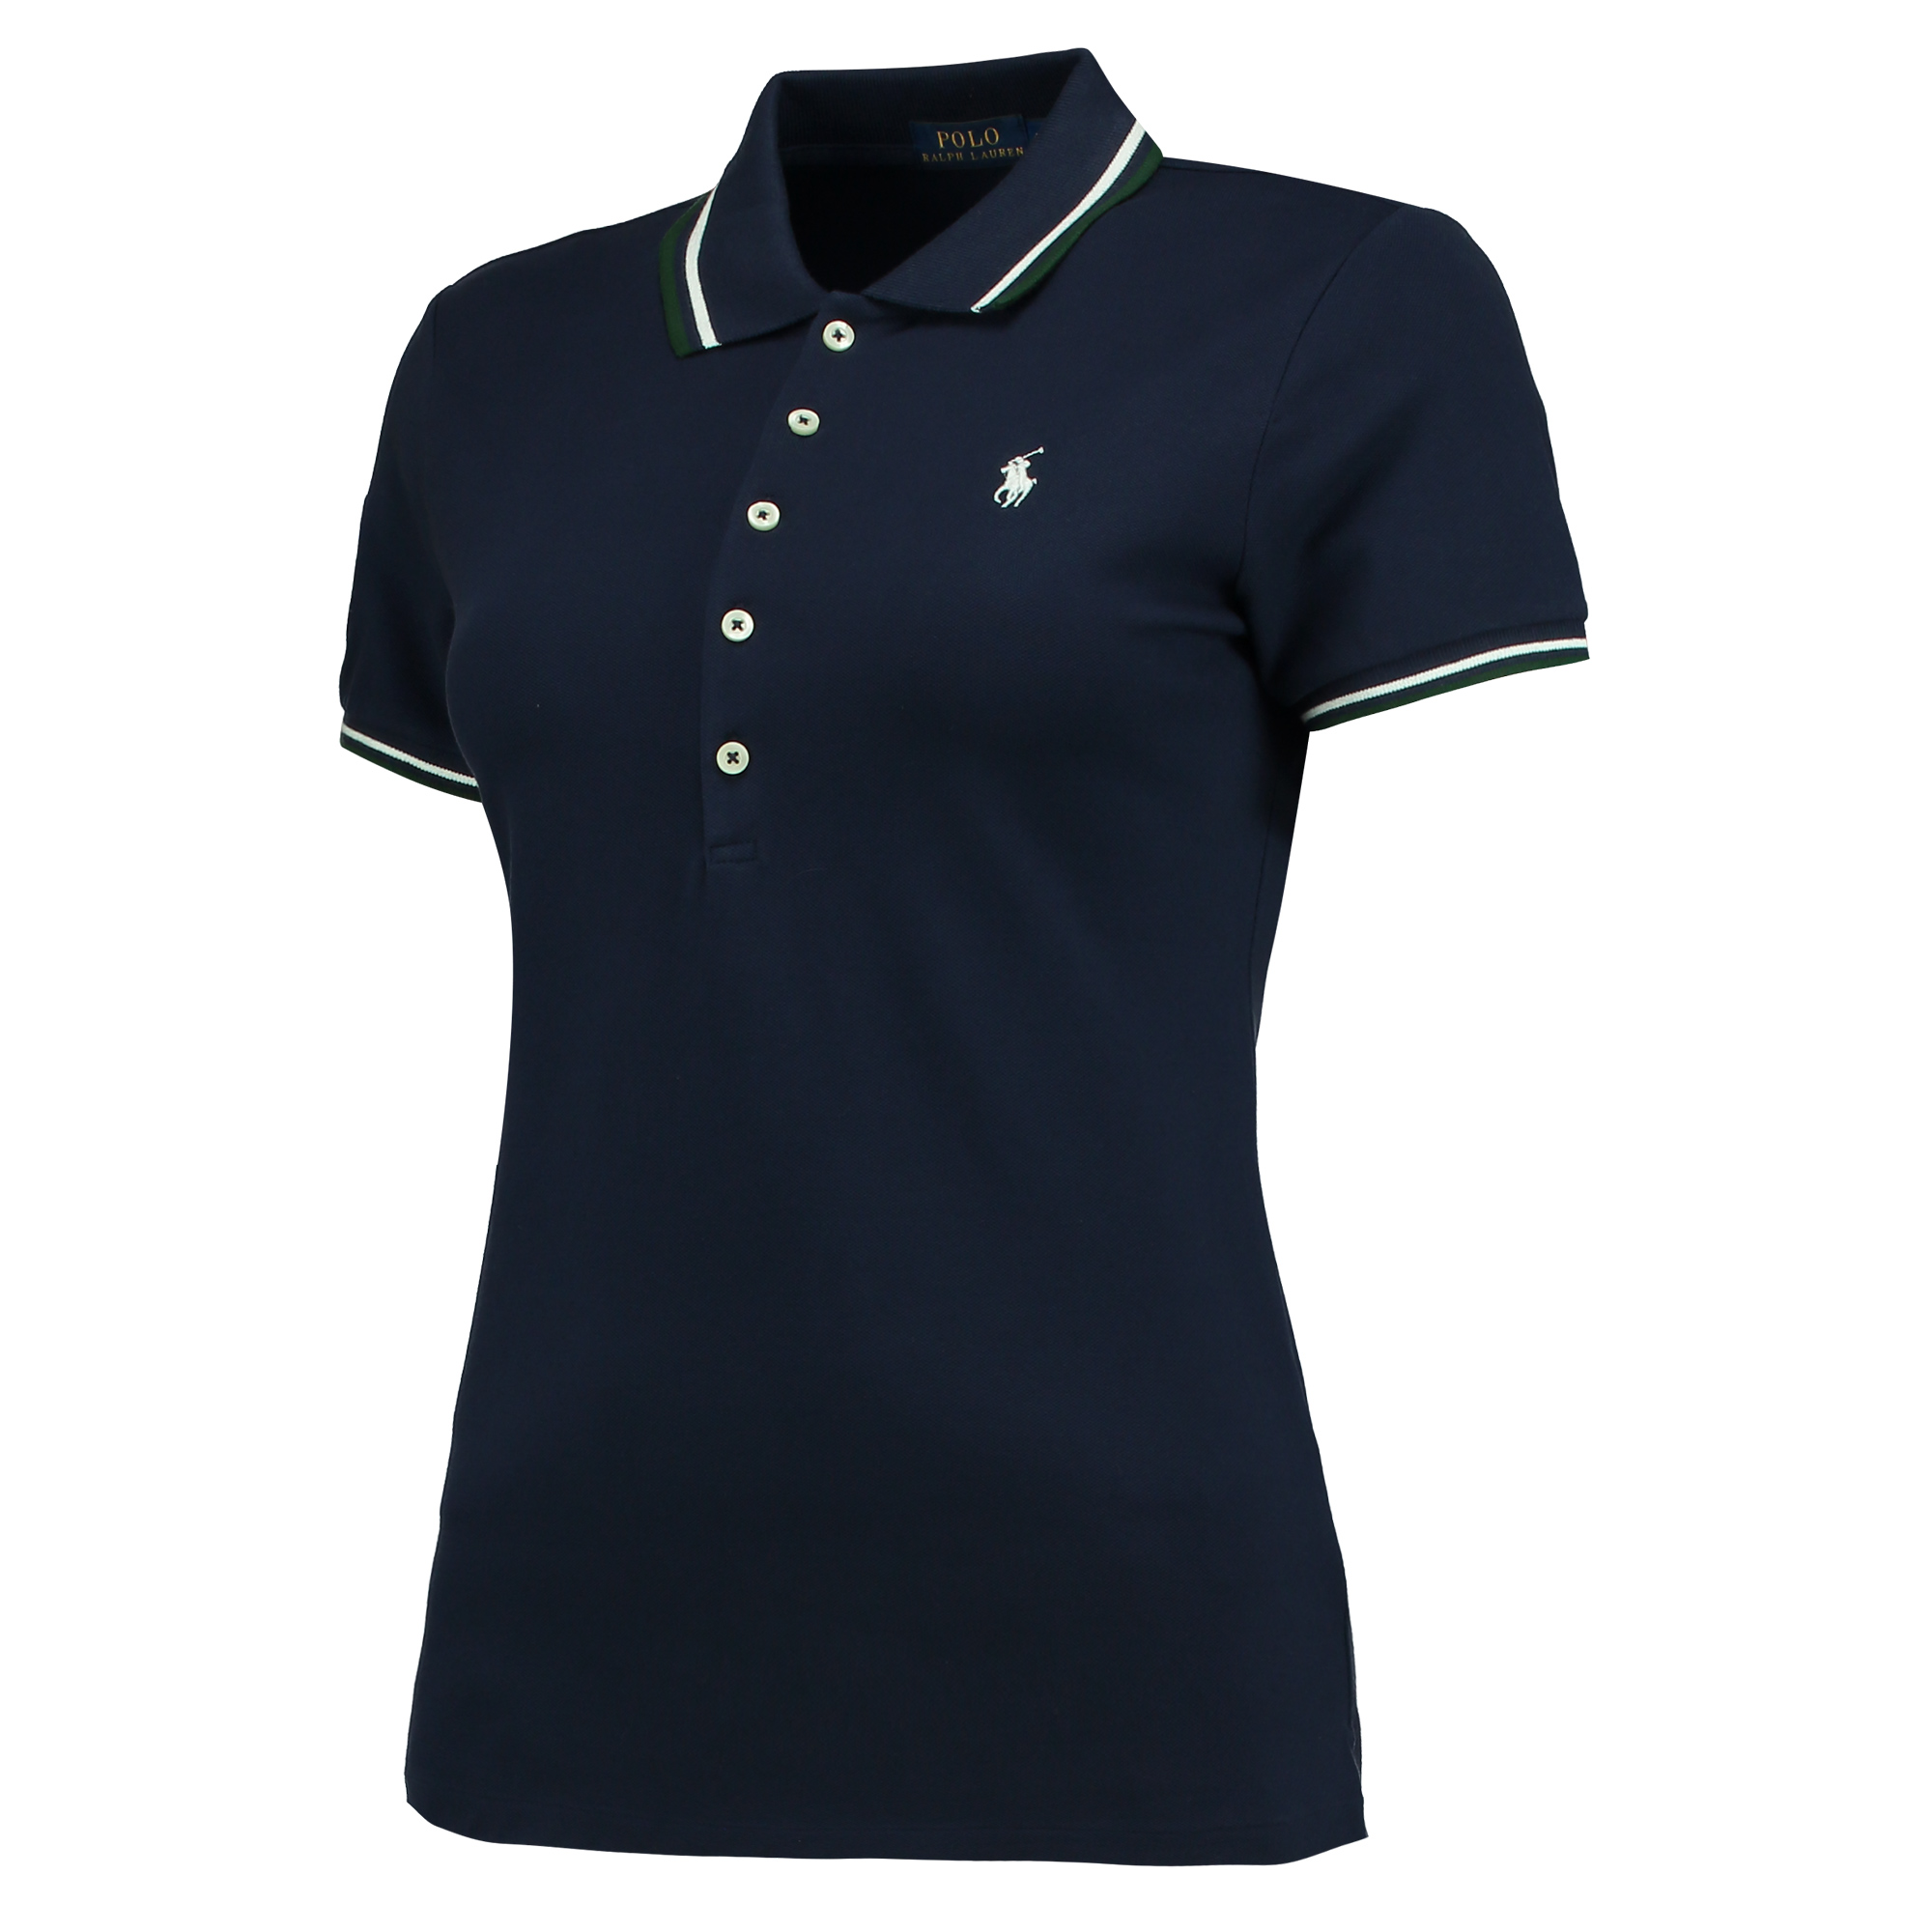 Wimbledon Ralph Lauren Polo - French Navy - Ladies